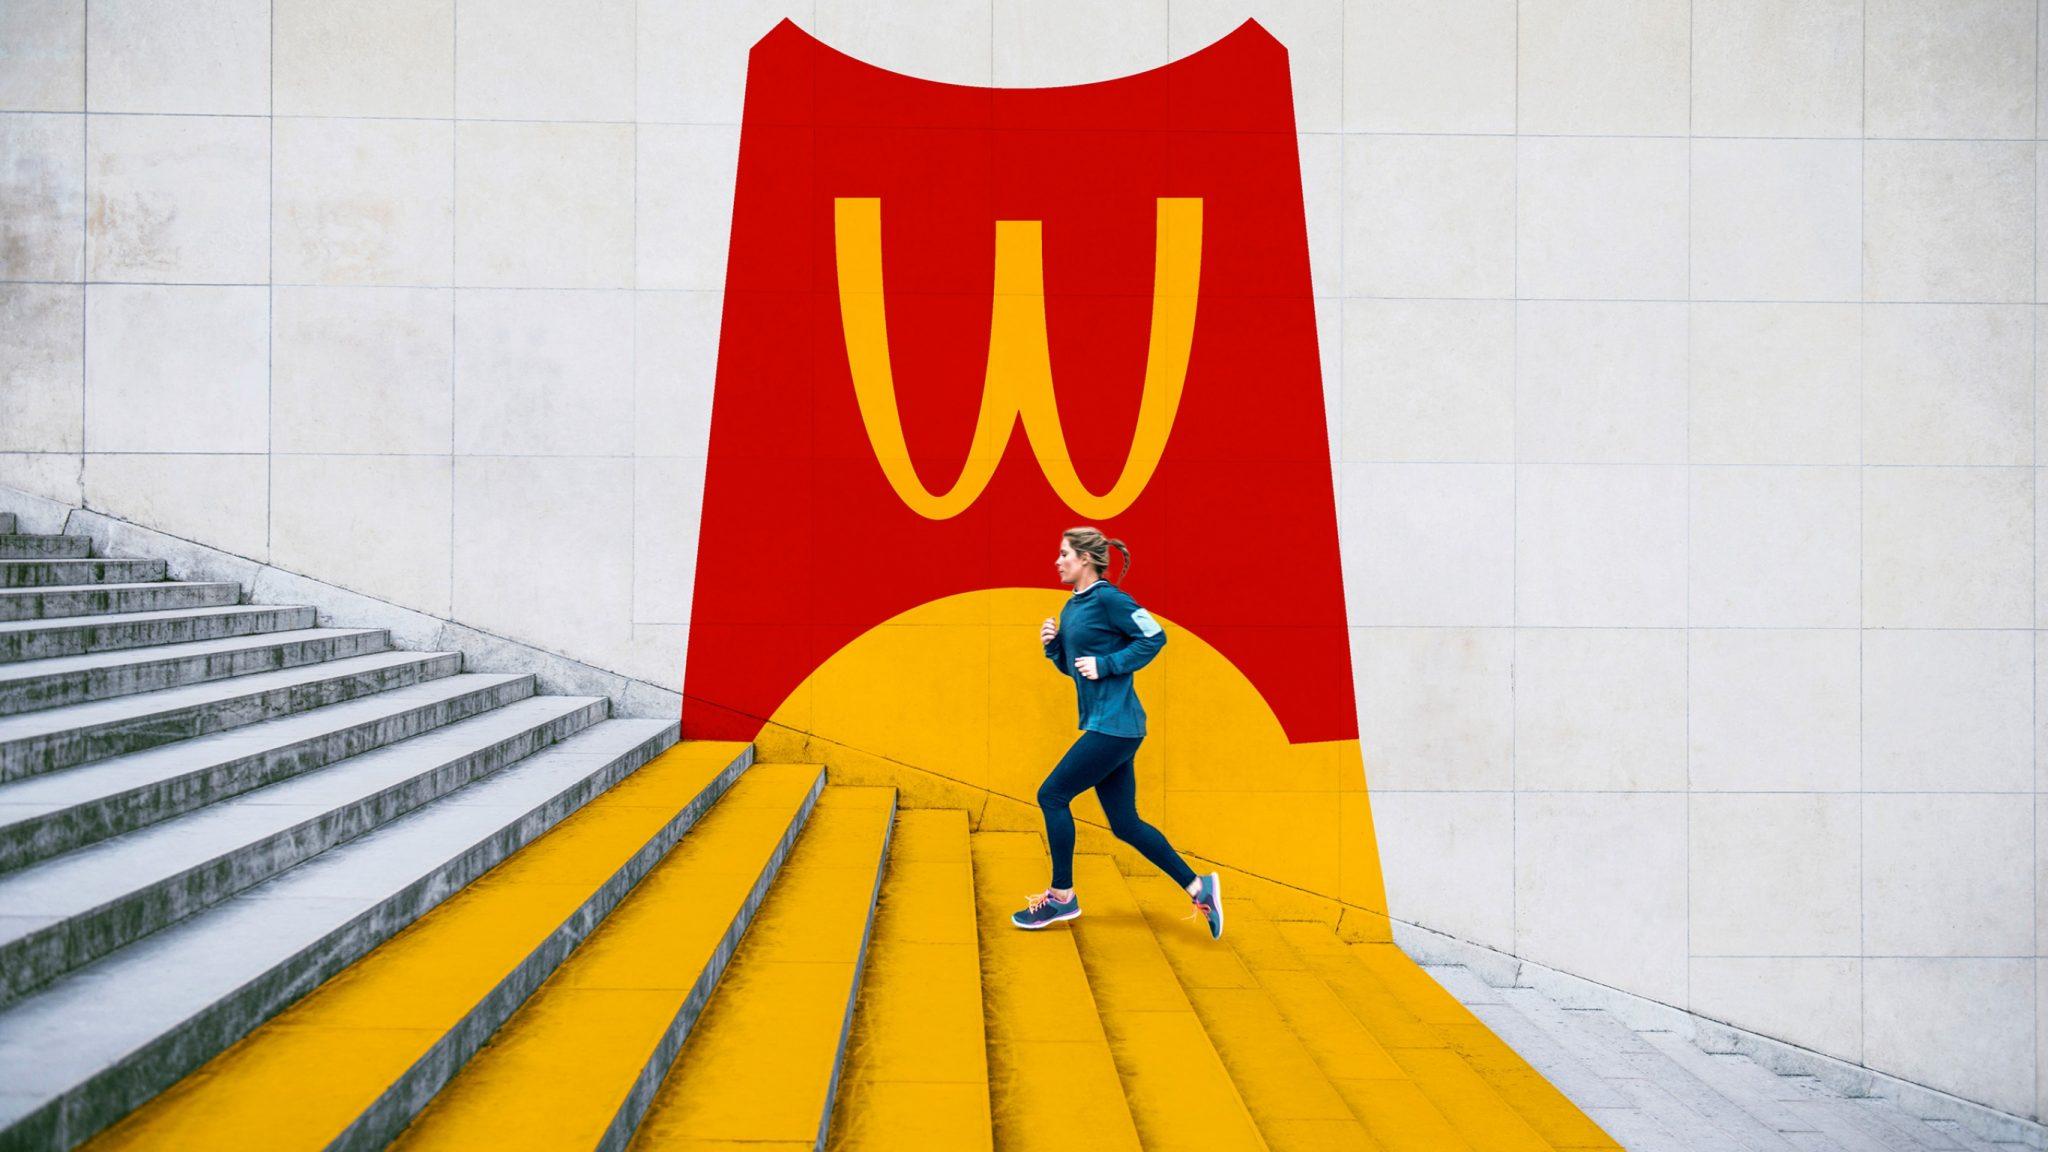 Design studio, Turner Duckworth and McDonald's campaign